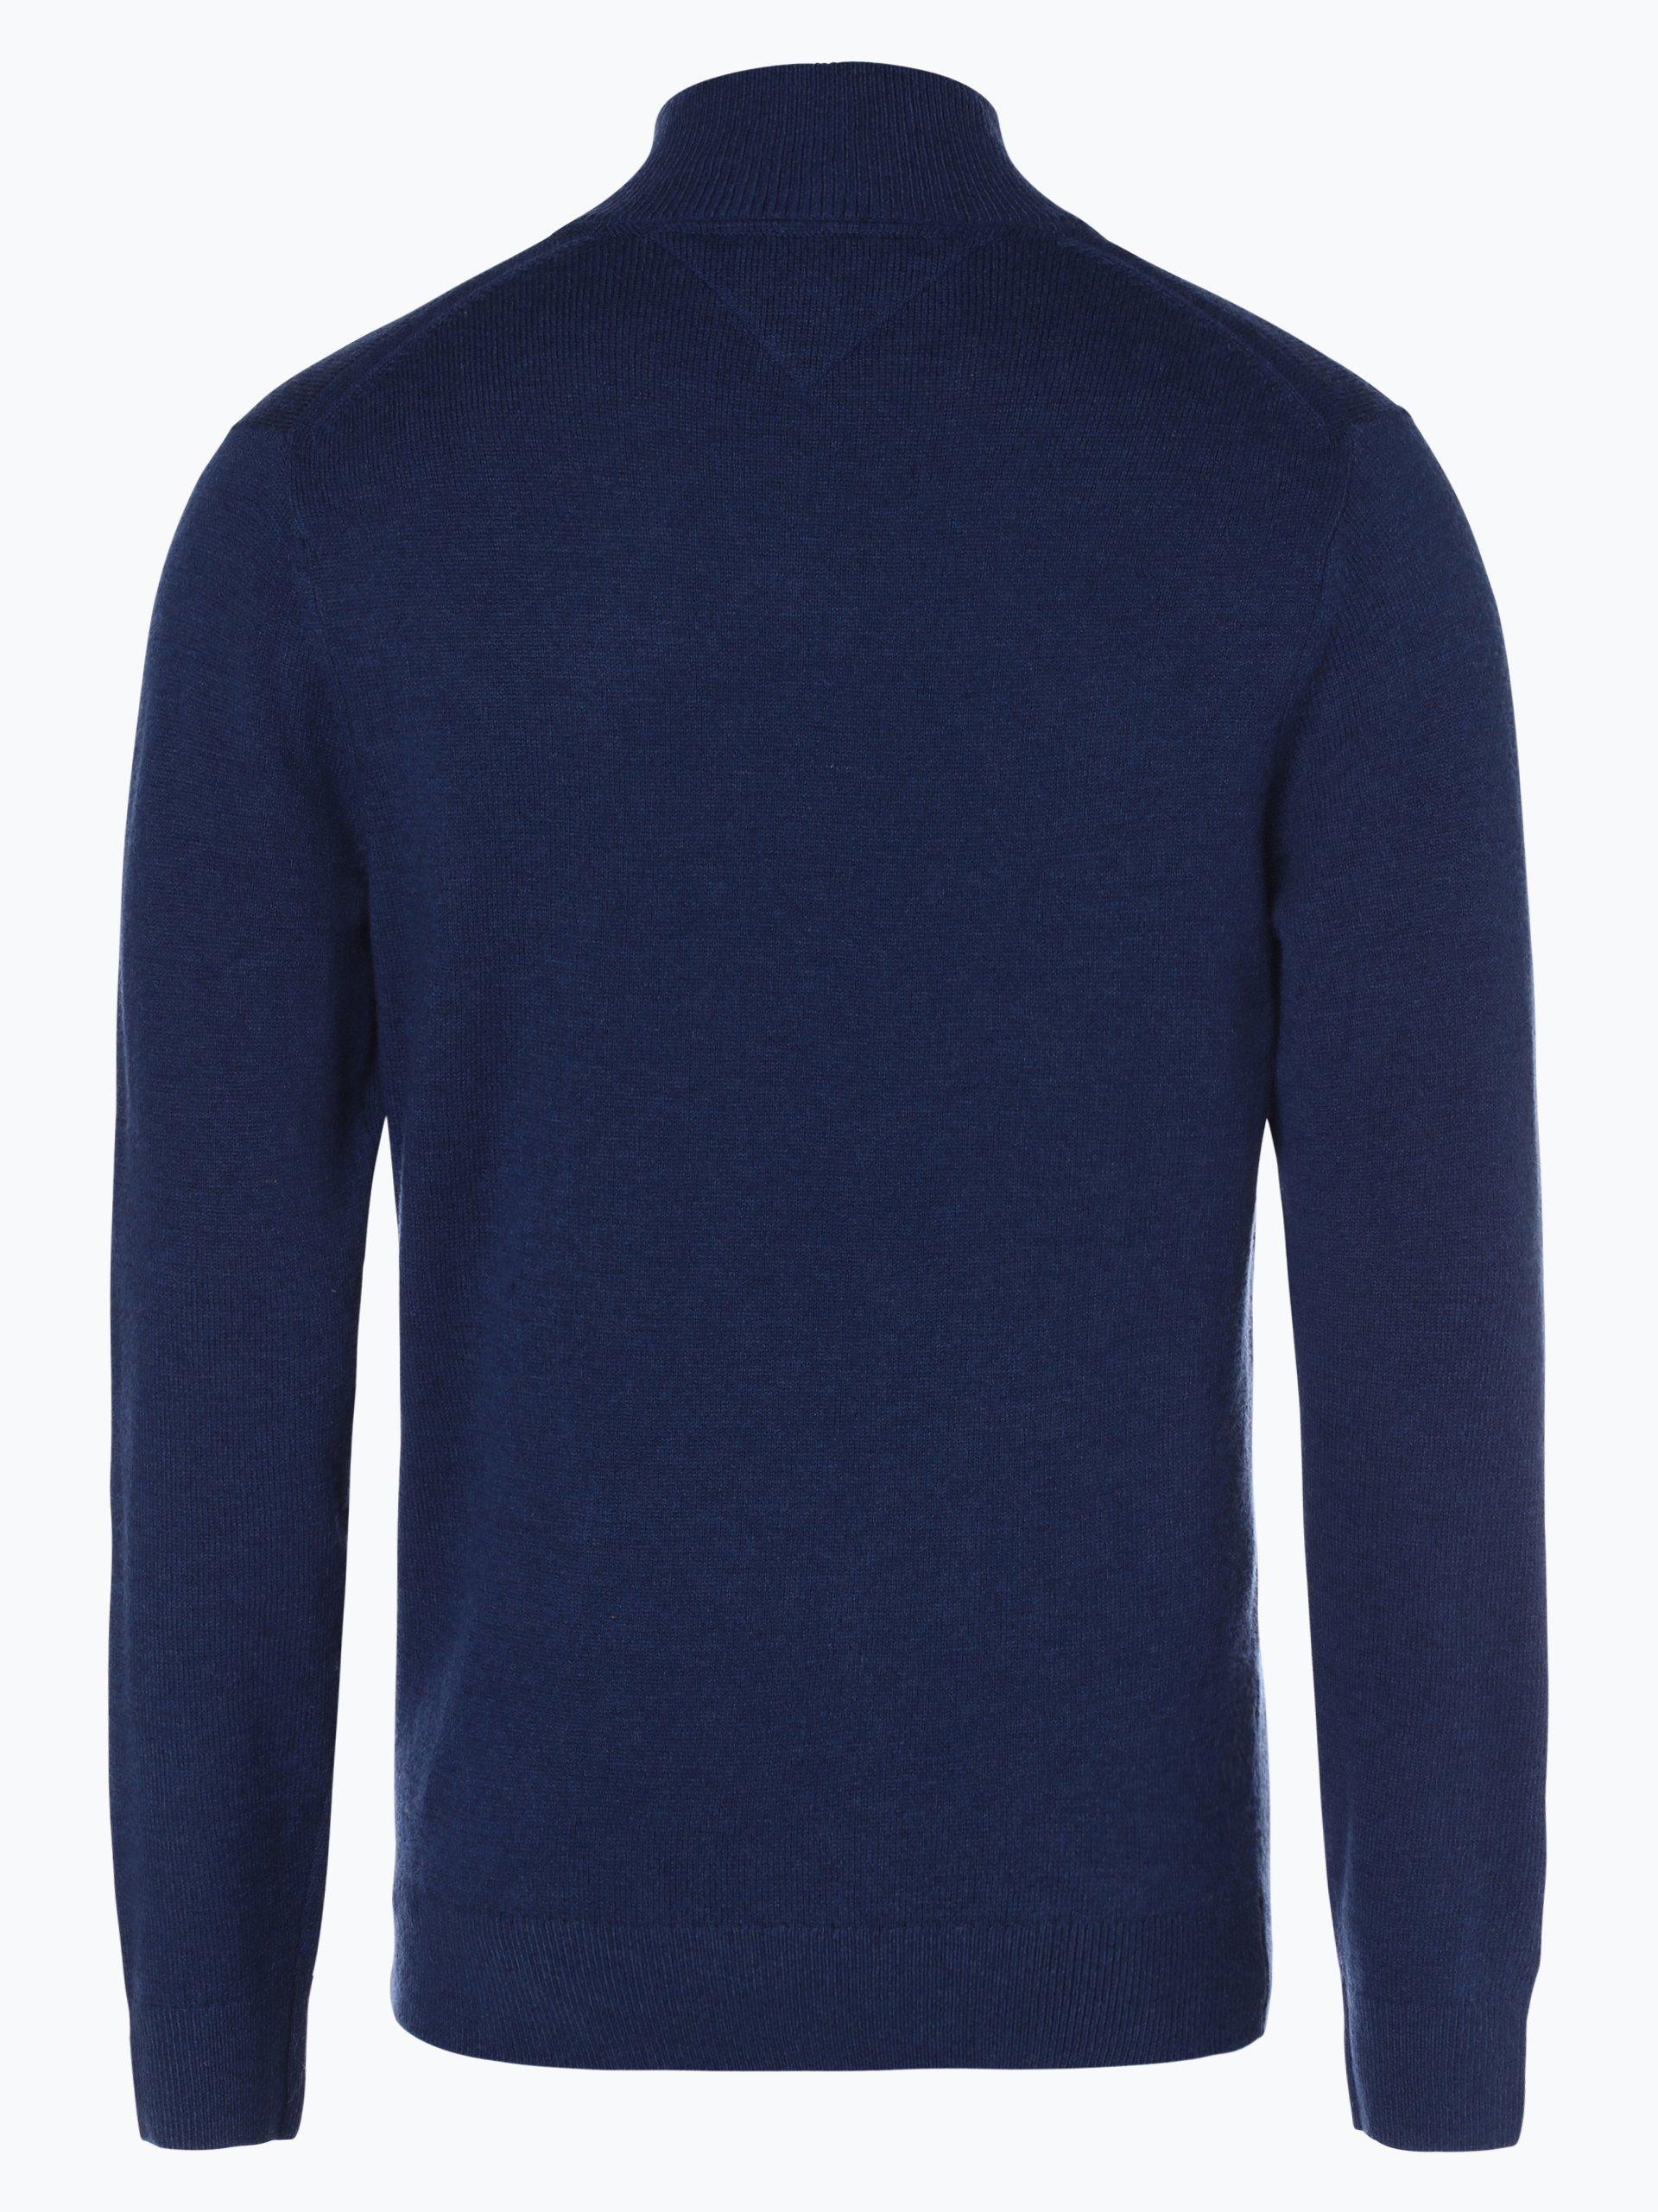 tommy hilfiger herren pullover blau uni online kaufen. Black Bedroom Furniture Sets. Home Design Ideas